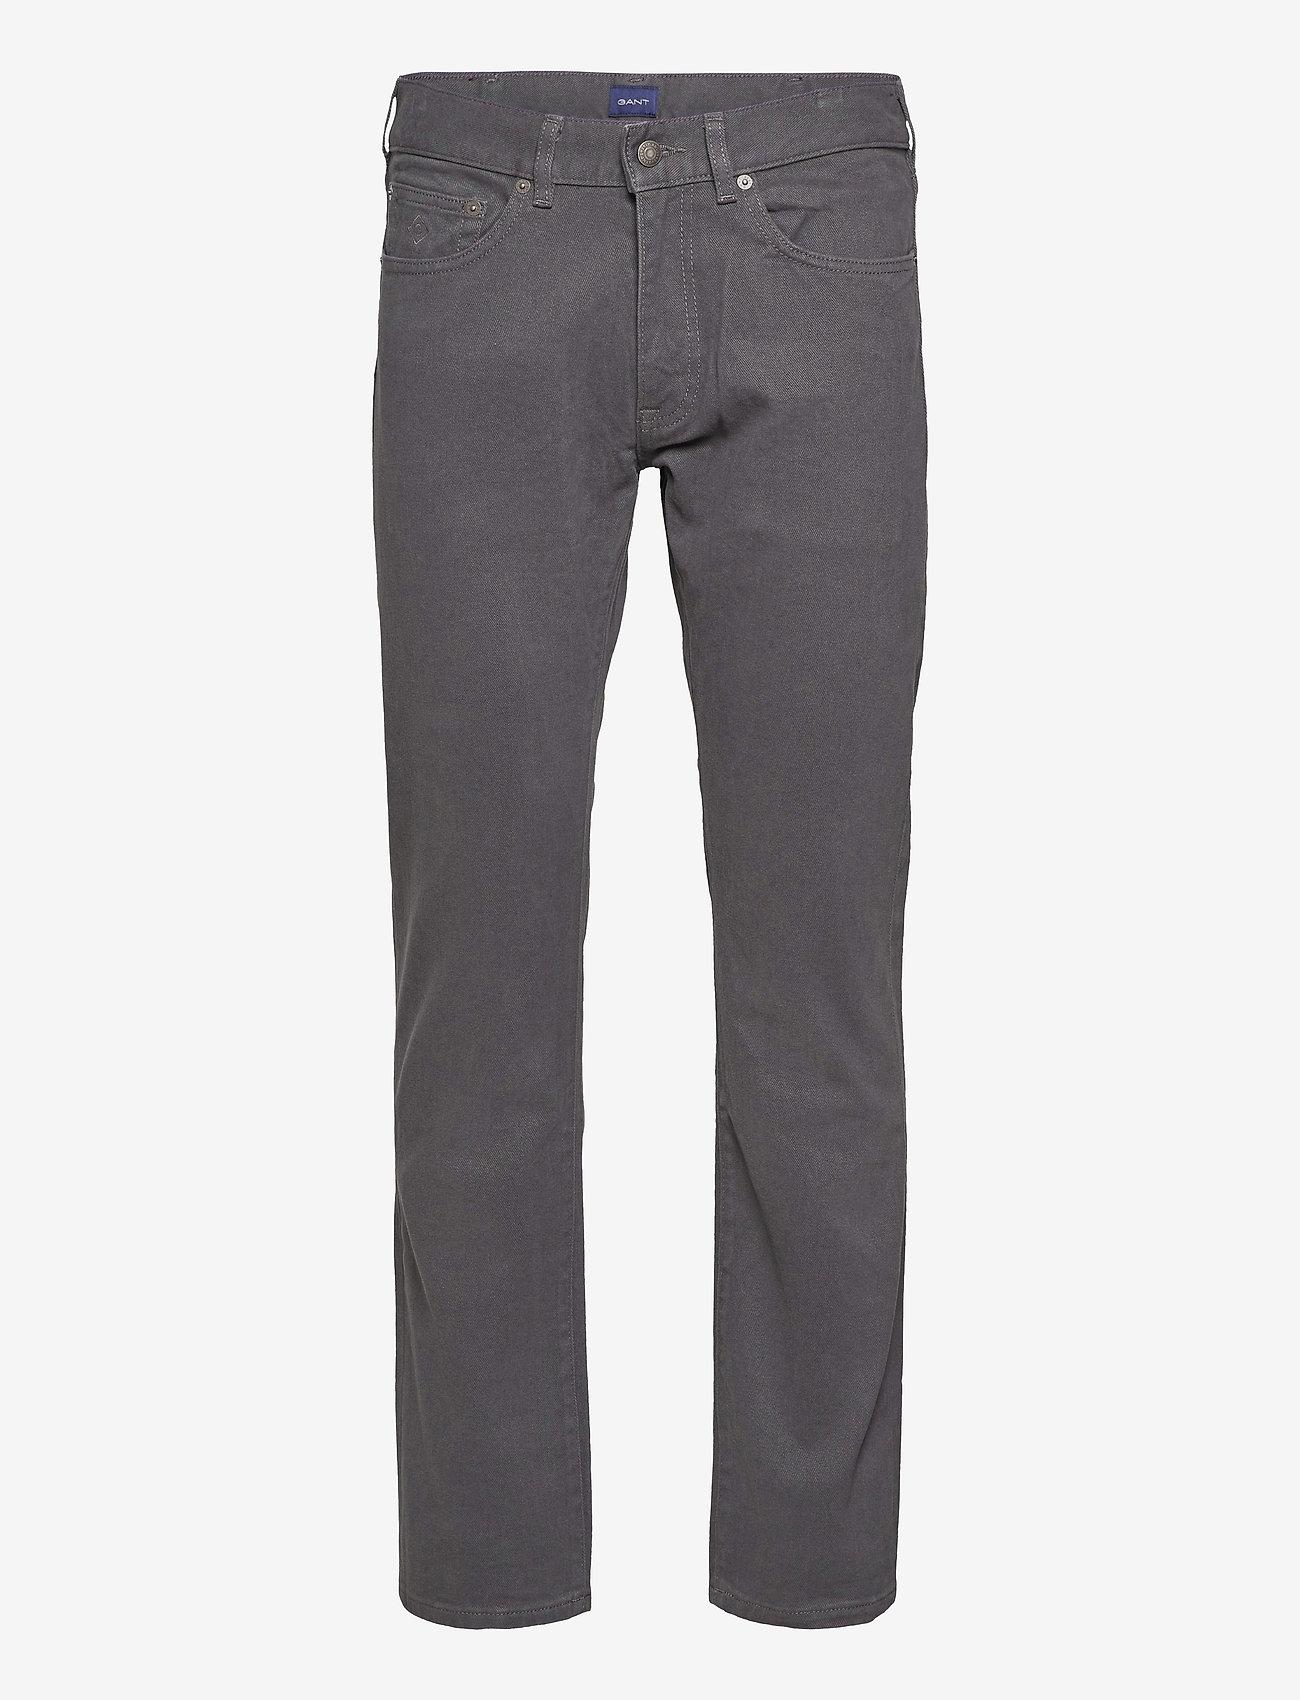 GANT - D2. REGULAR SOFT TWILL JEANS - regular jeans - antracite - 0